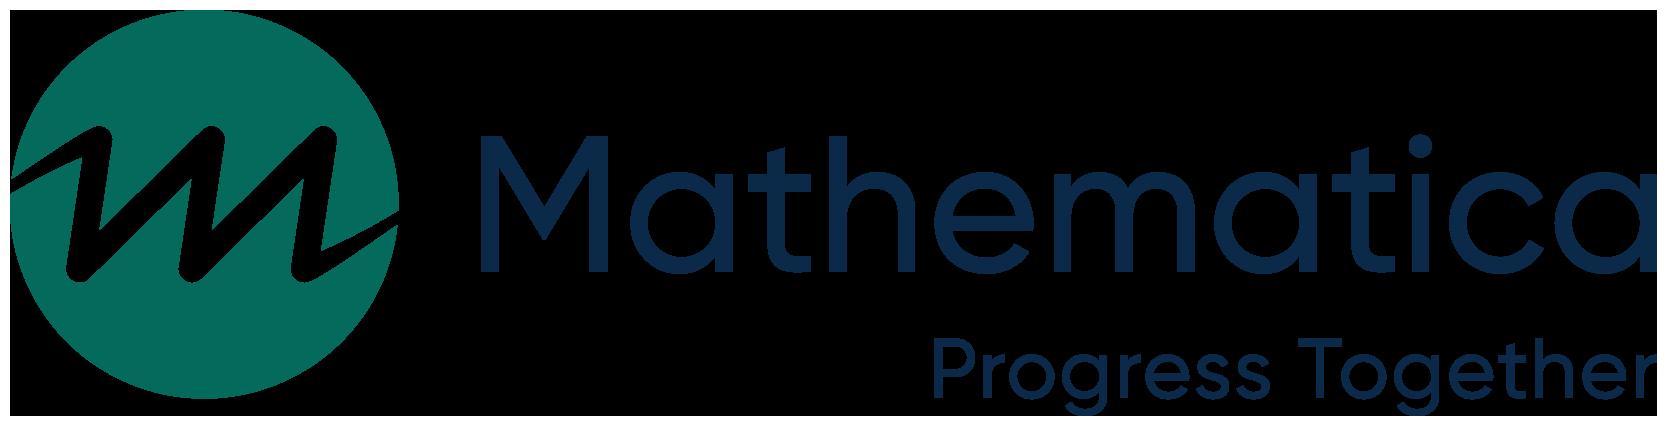 #2021APPAM Spotlight: Mathematica